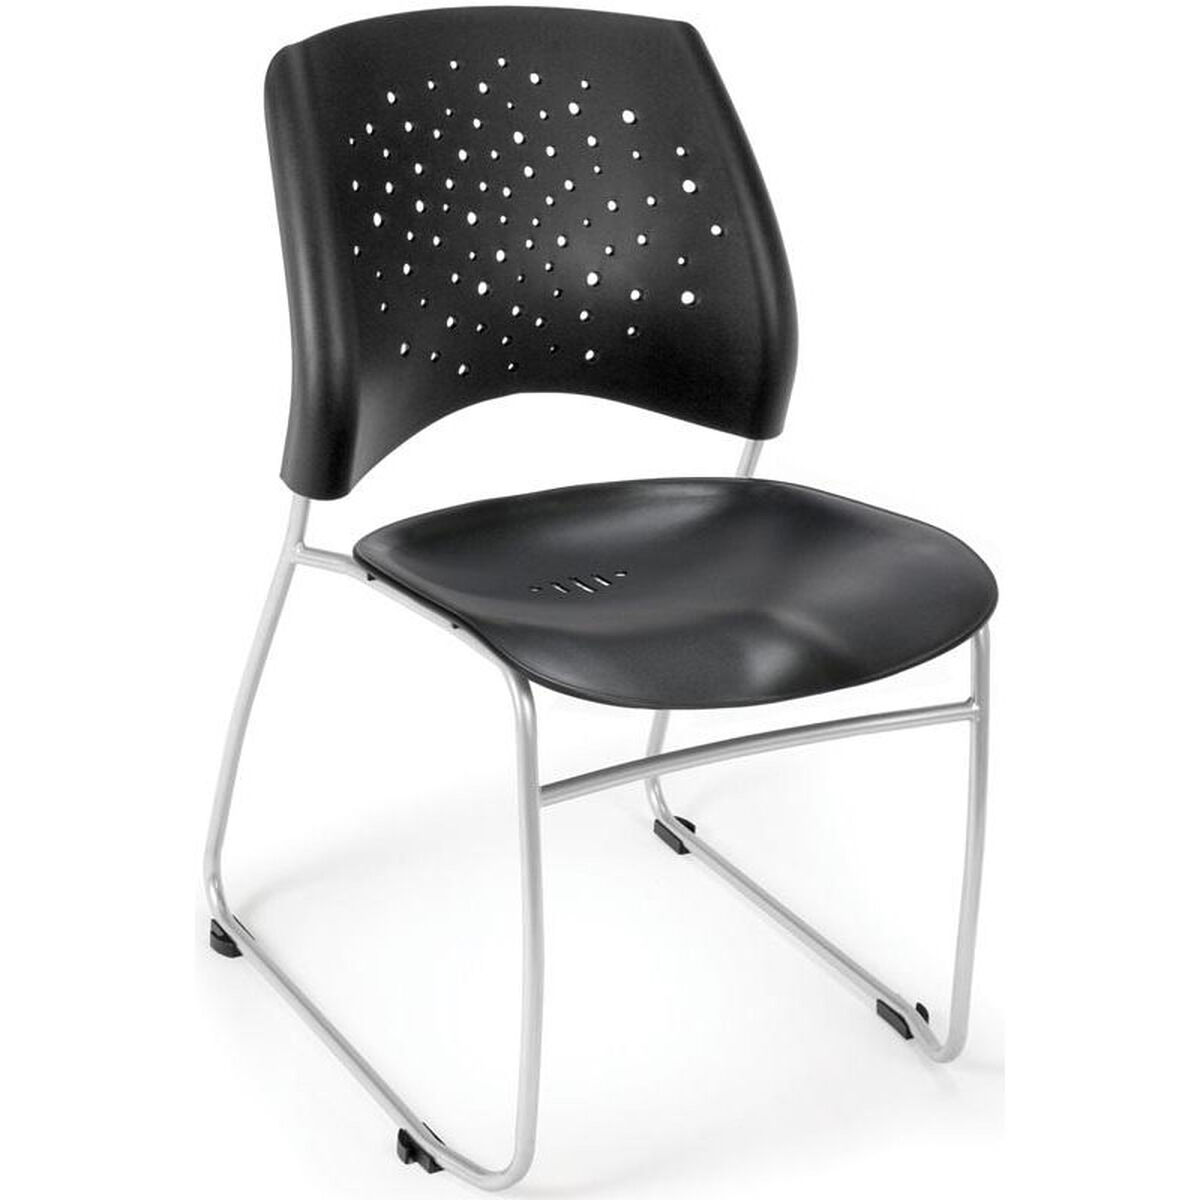 stars plastic stack chair black 325 p blk. Black Bedroom Furniture Sets. Home Design Ideas